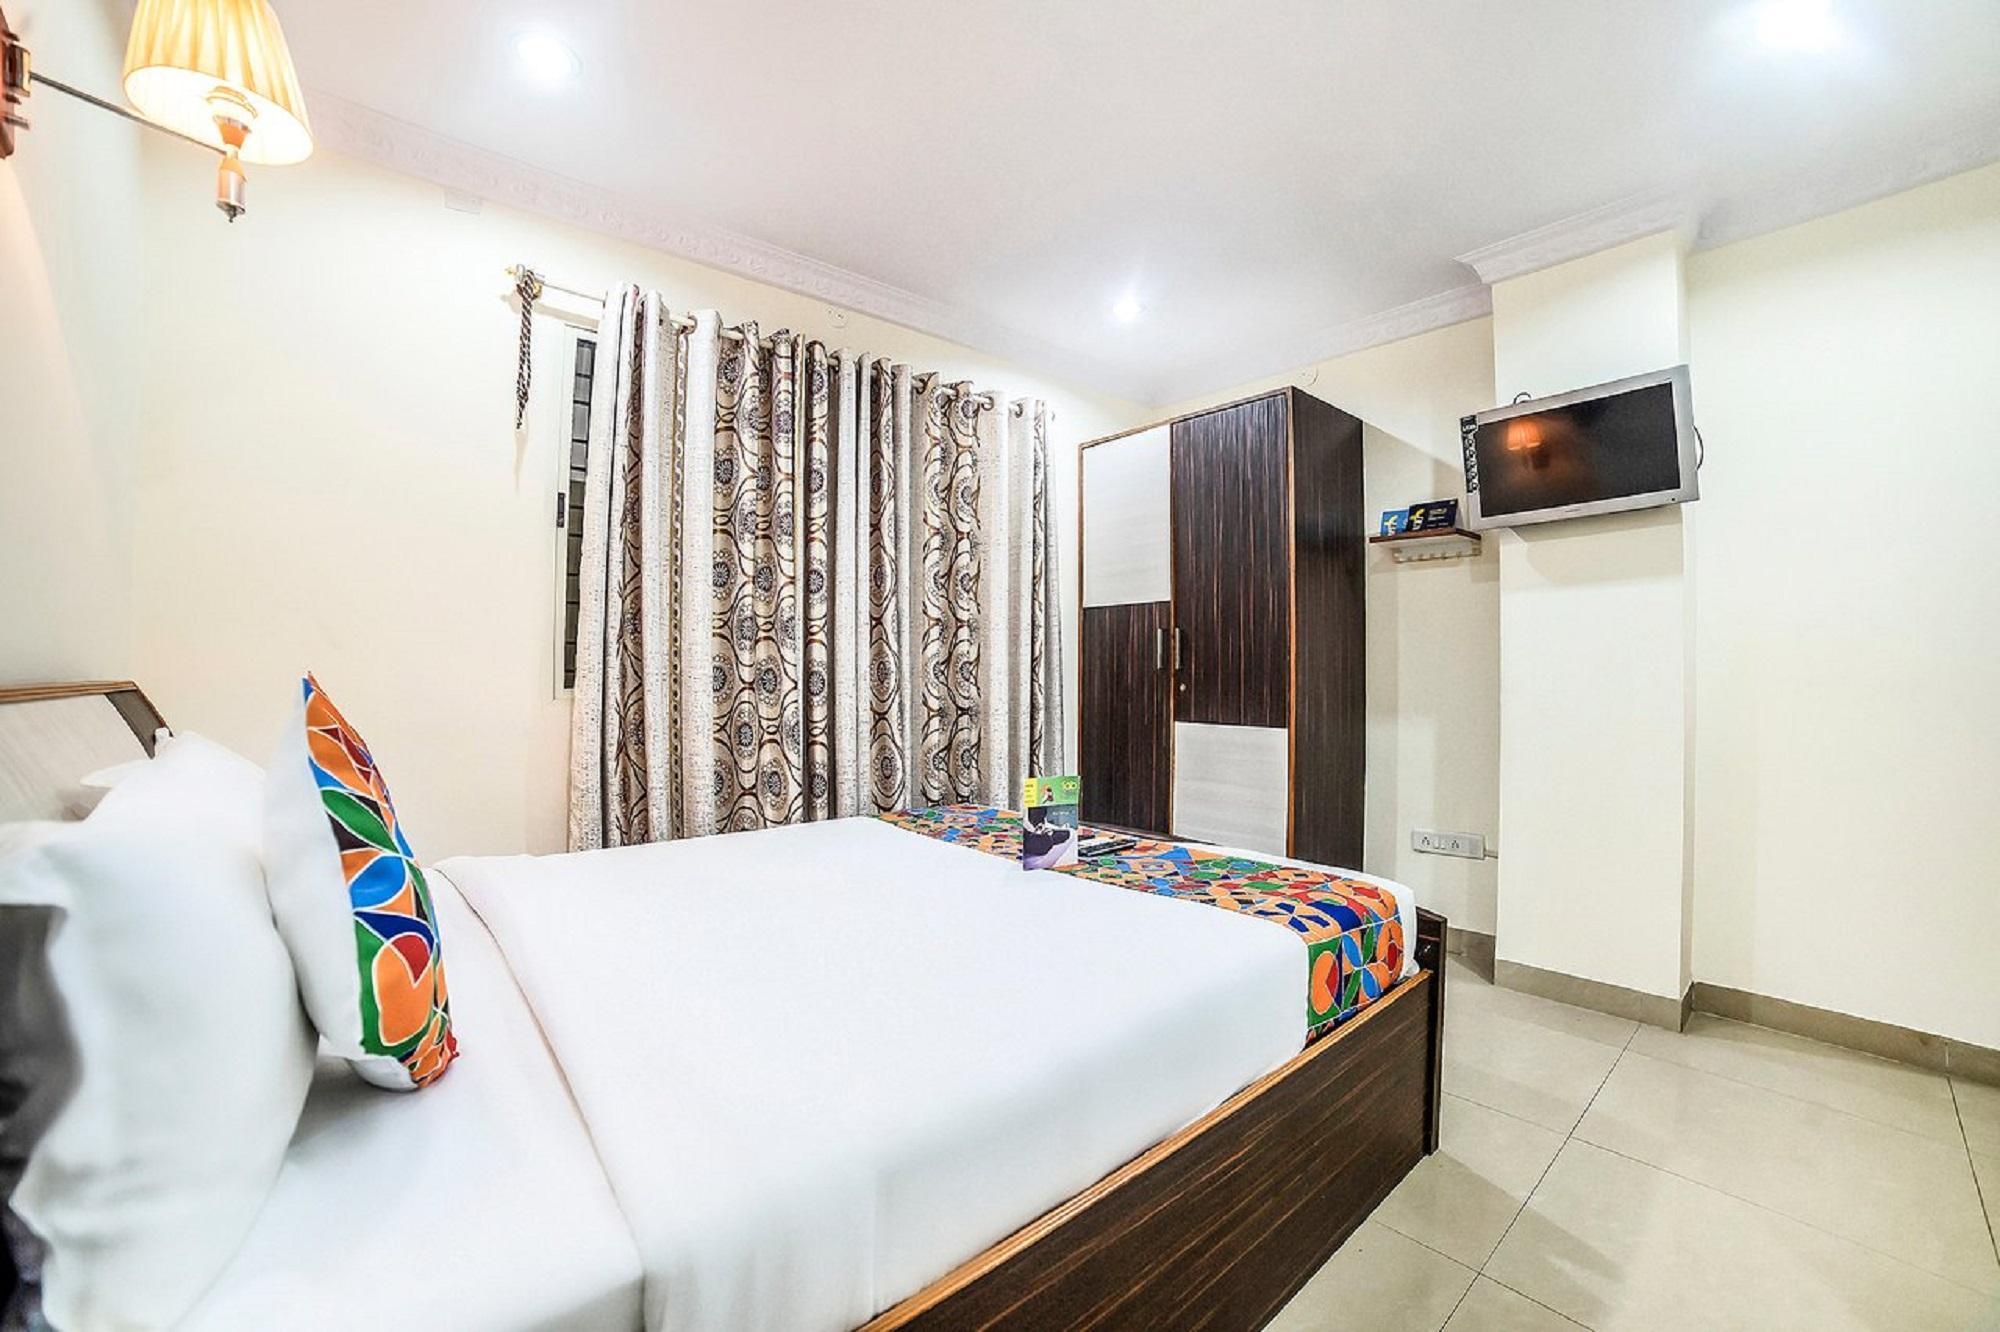 Wafi Suites BY Rofeka Hospitality